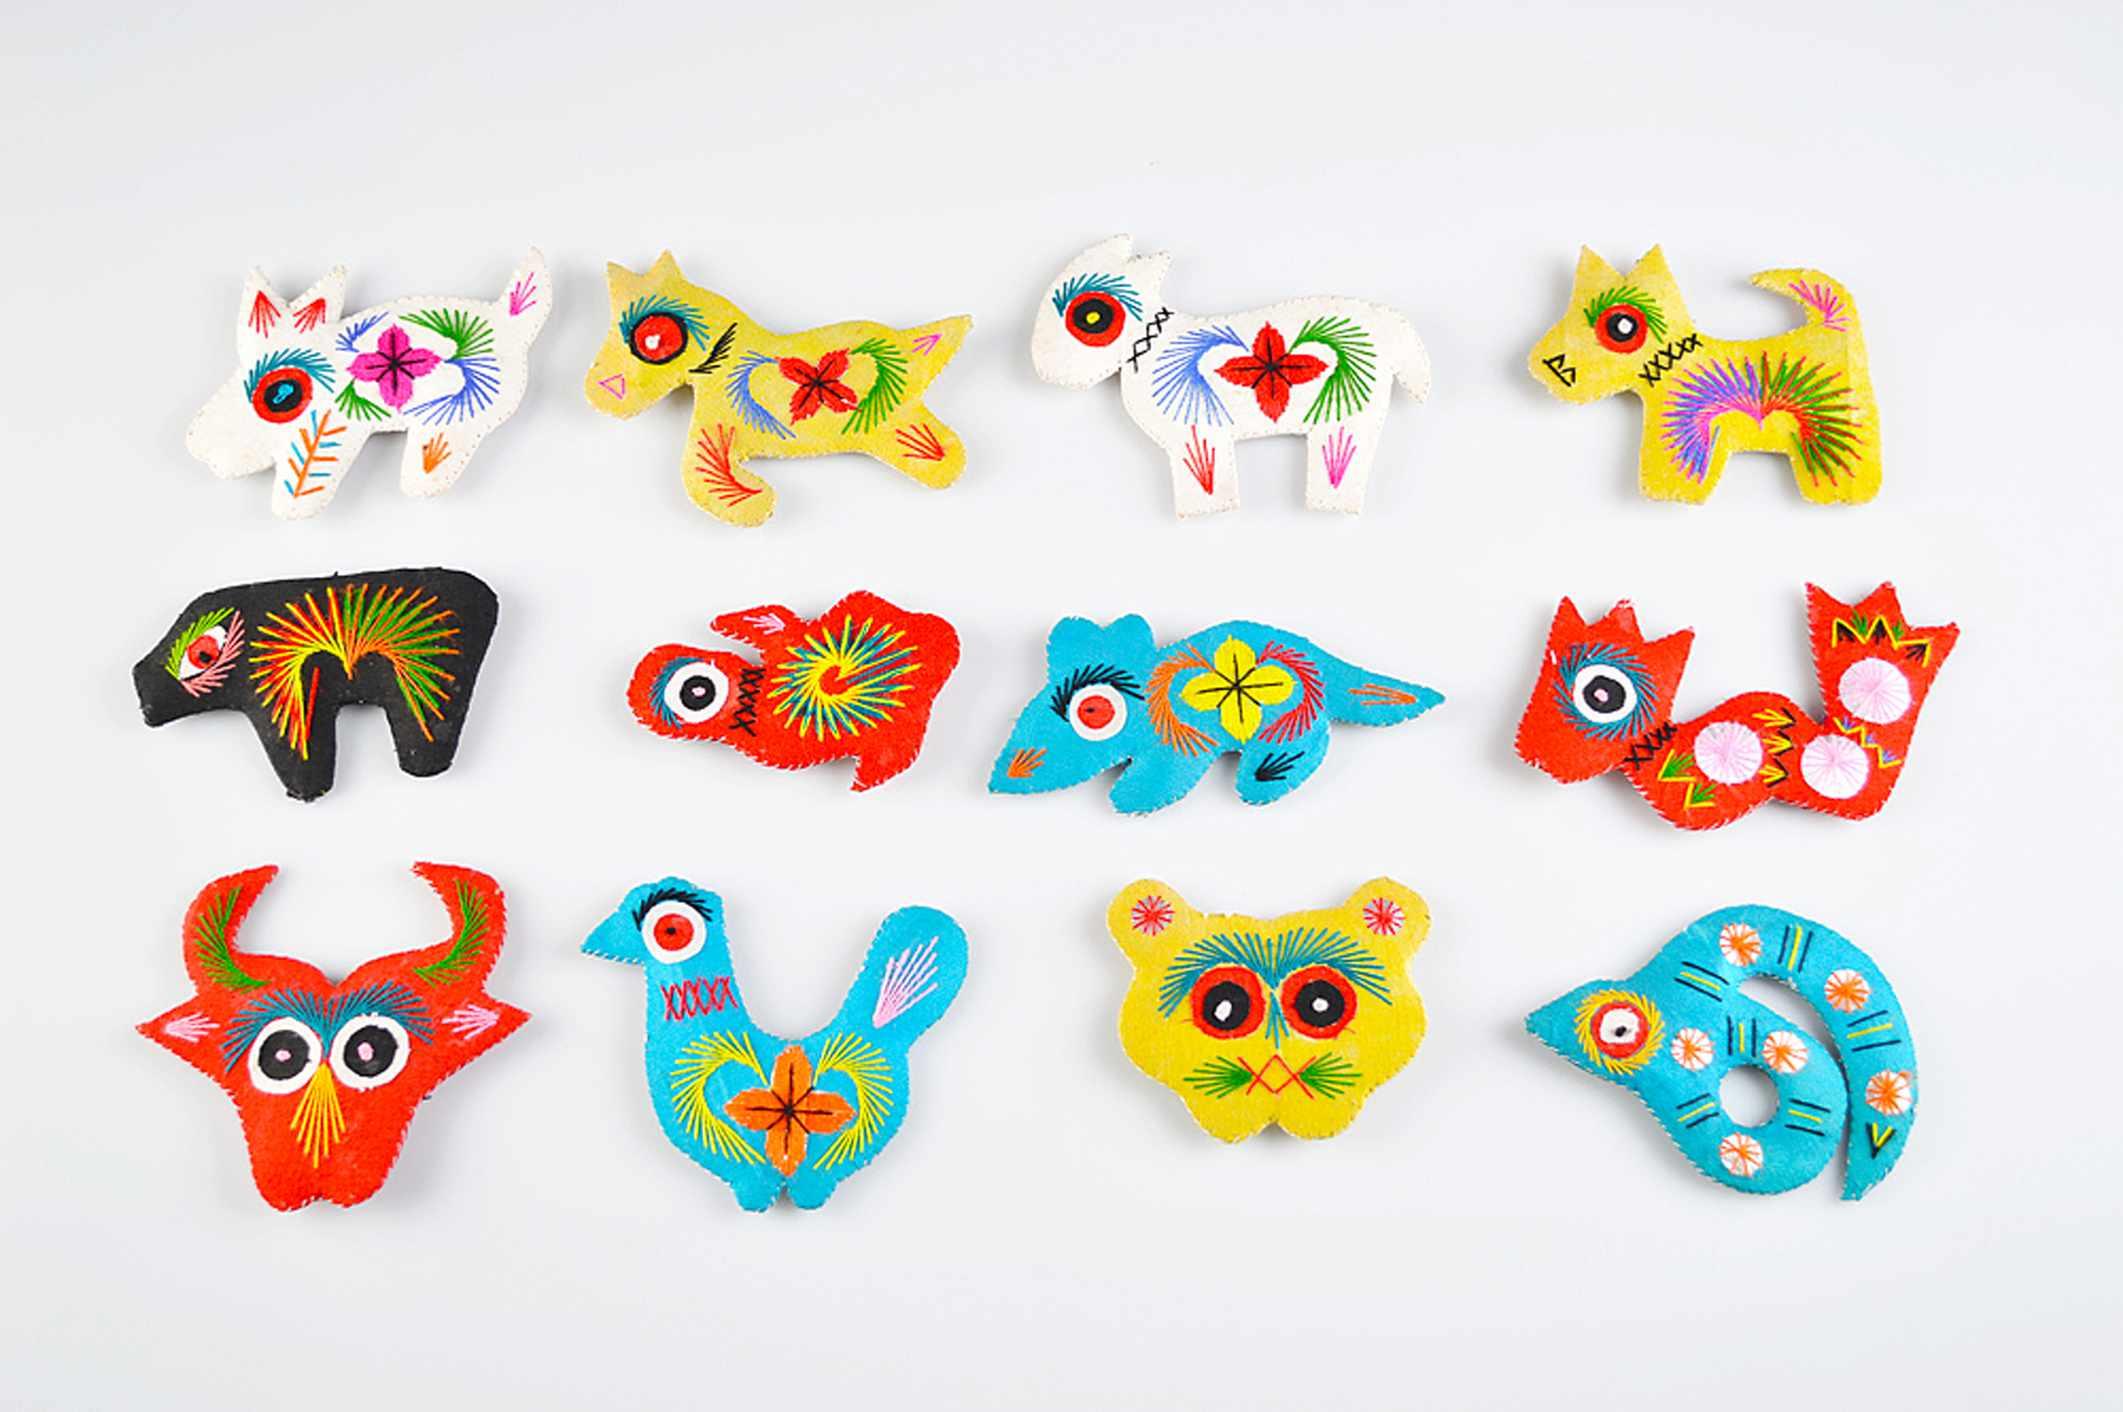 Chinese zodiac animal charms